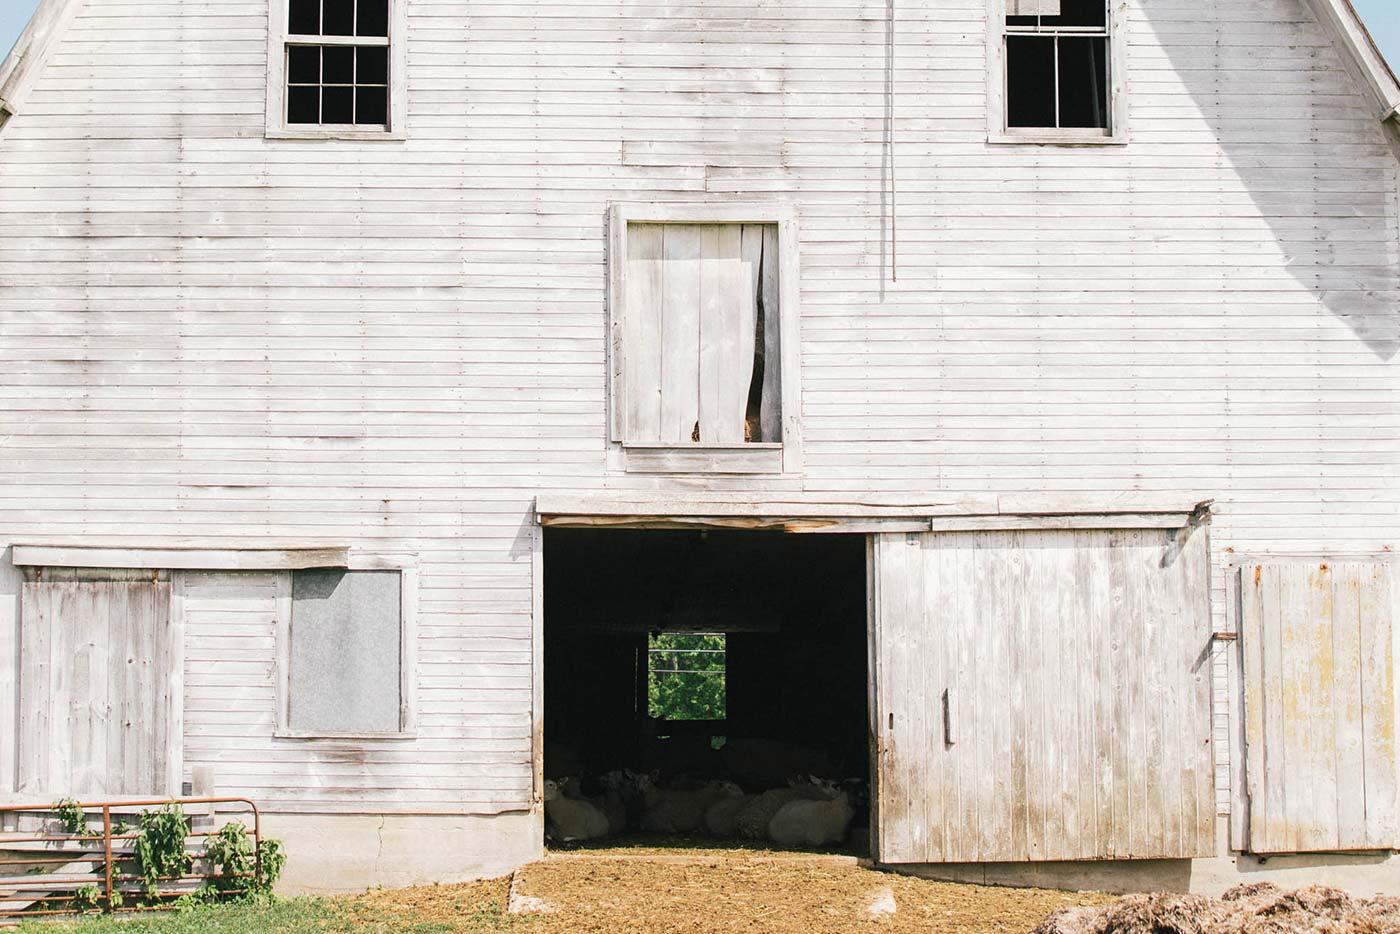 https://www.oakhurstdairy.com/wp-content/uploads/2021/09/farmer-imgs-halledge3-150x150.jpg